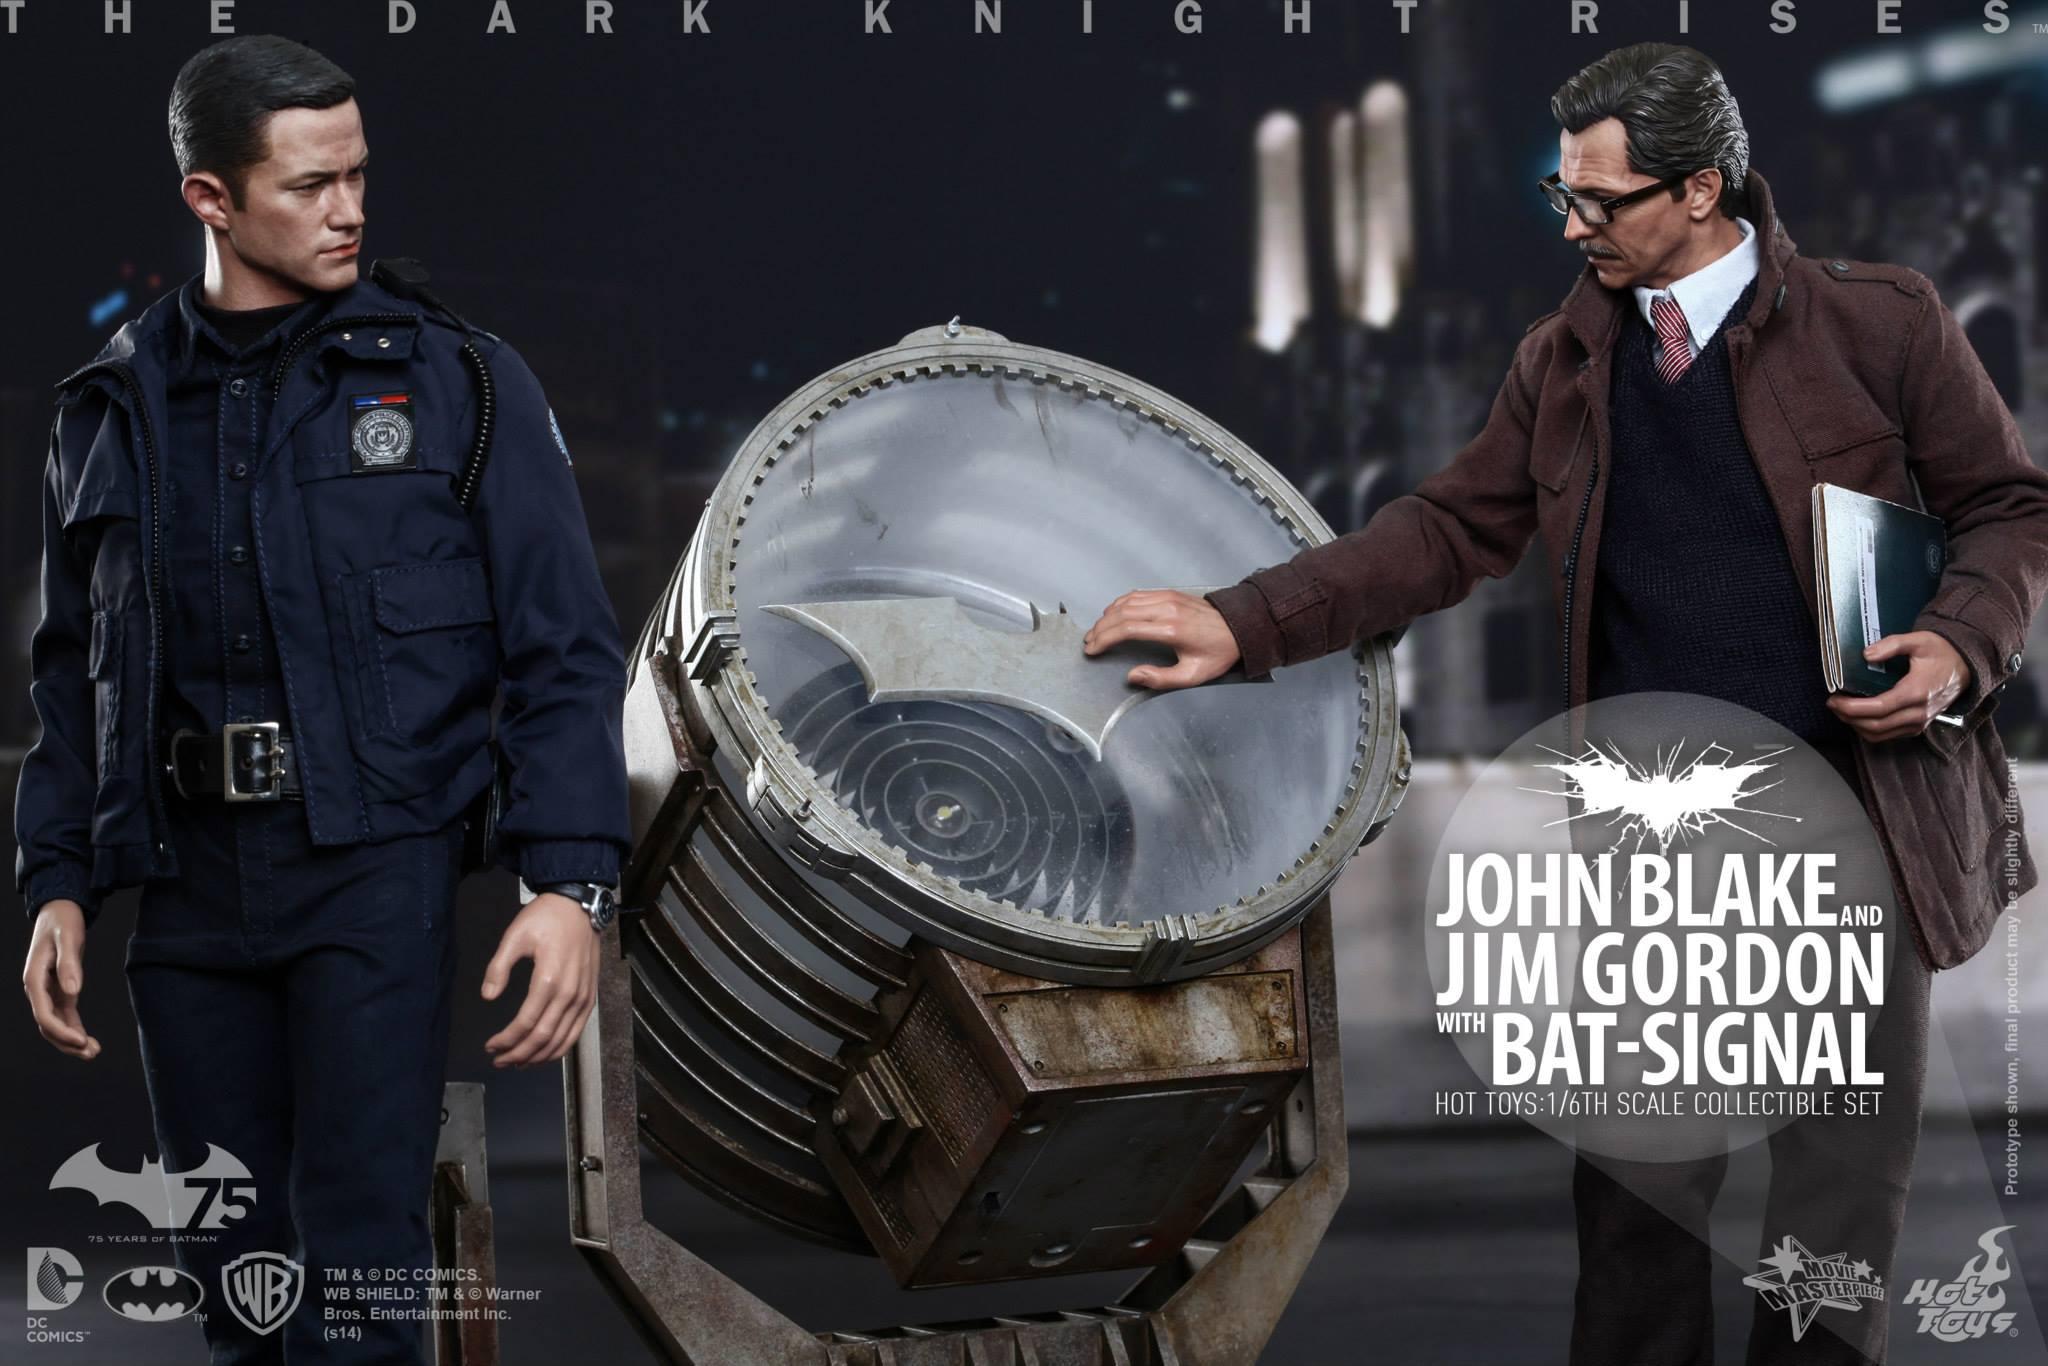 THE DARK KNIGHT RISES - Lt. JIM GORDON & JOHN BLAKE w/BATSIGNAL 234081101